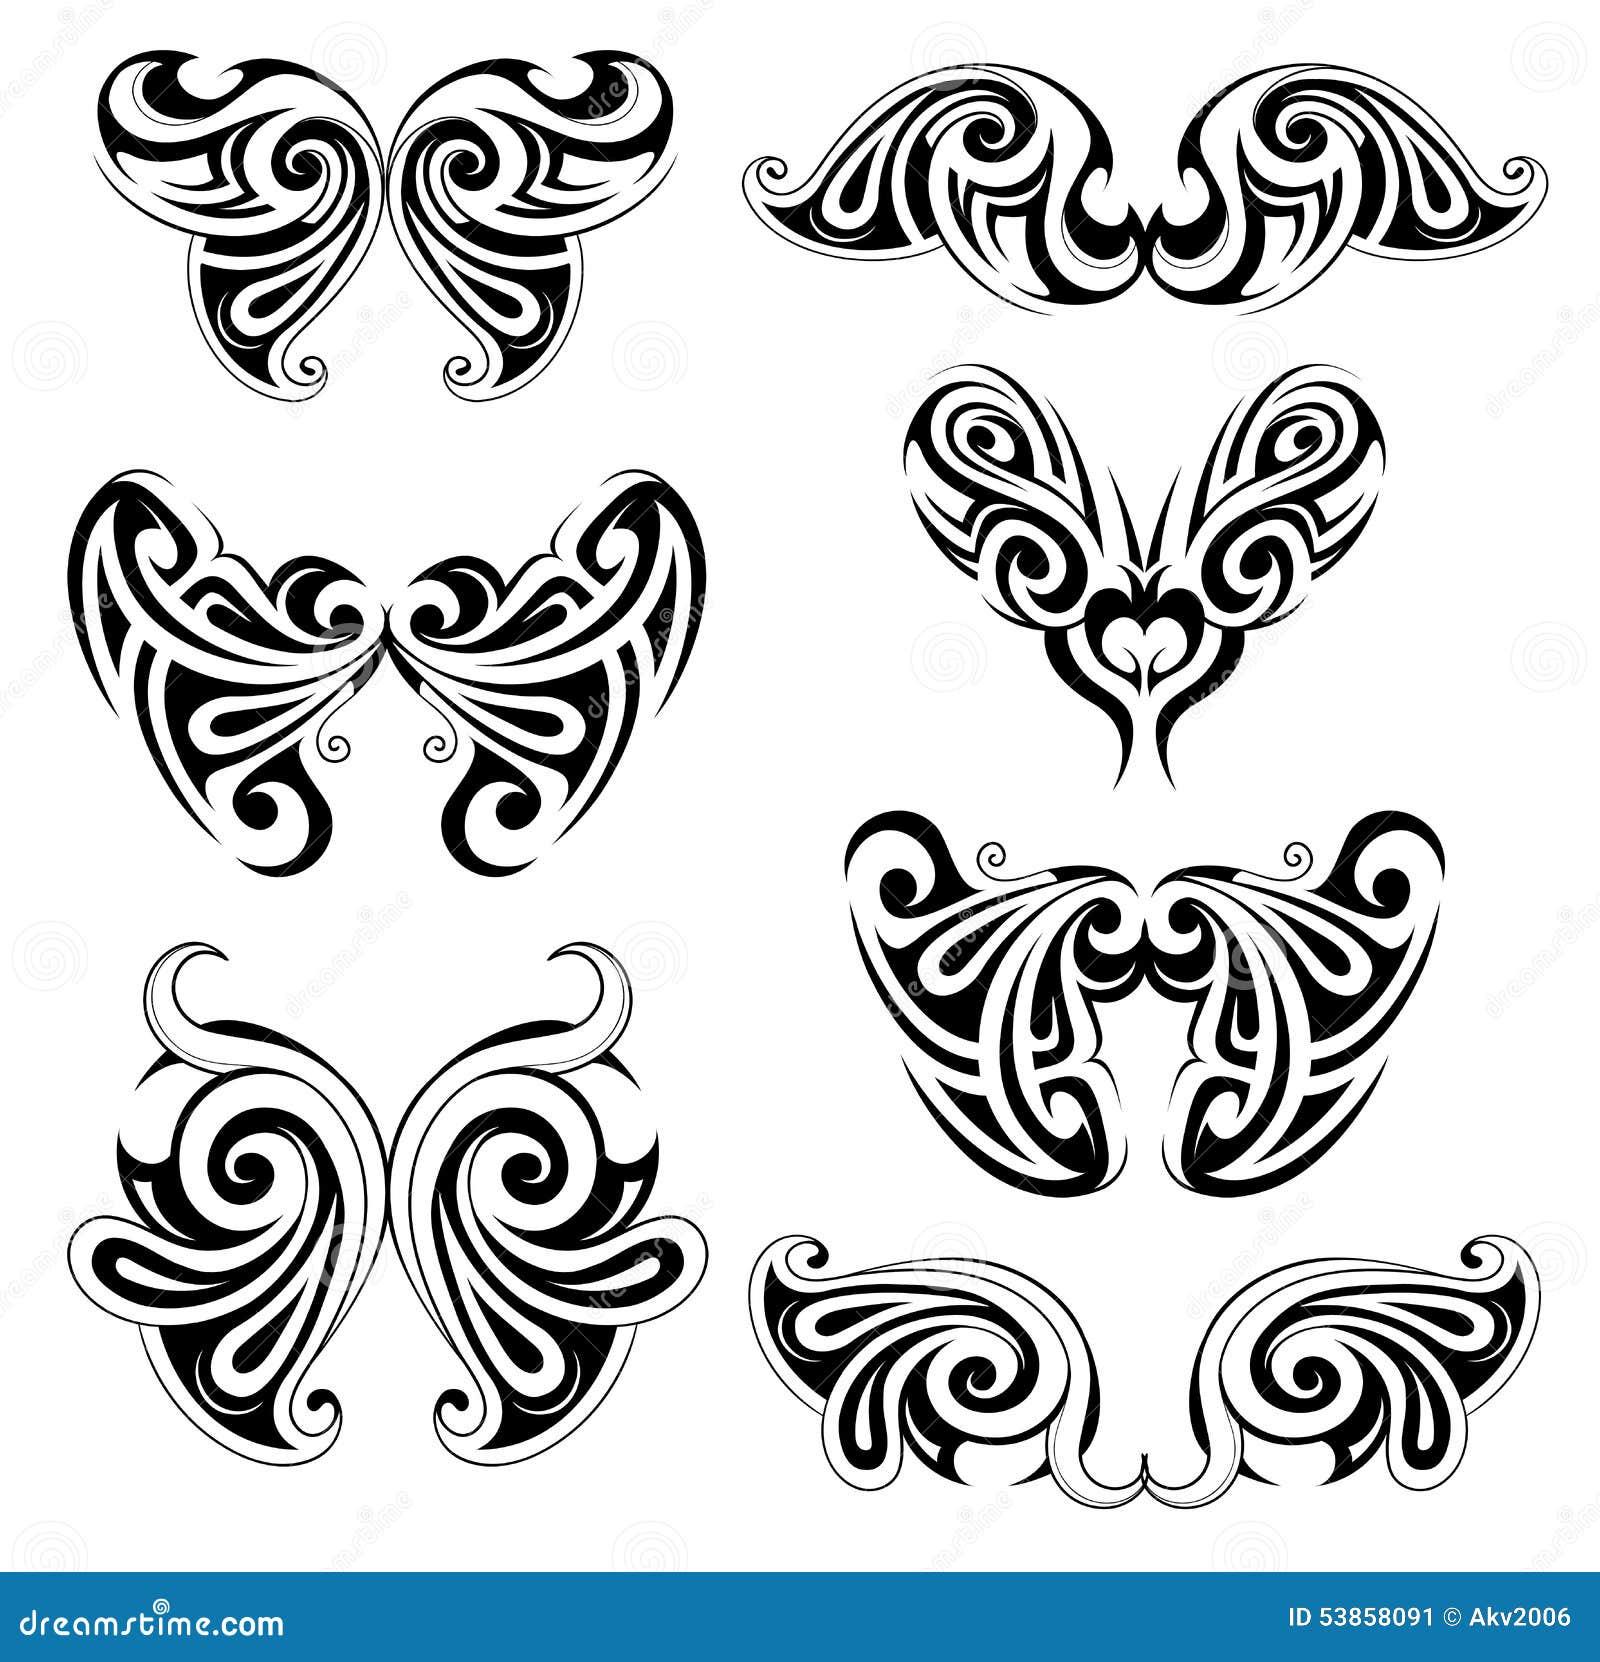 Reeks vleugelvormen